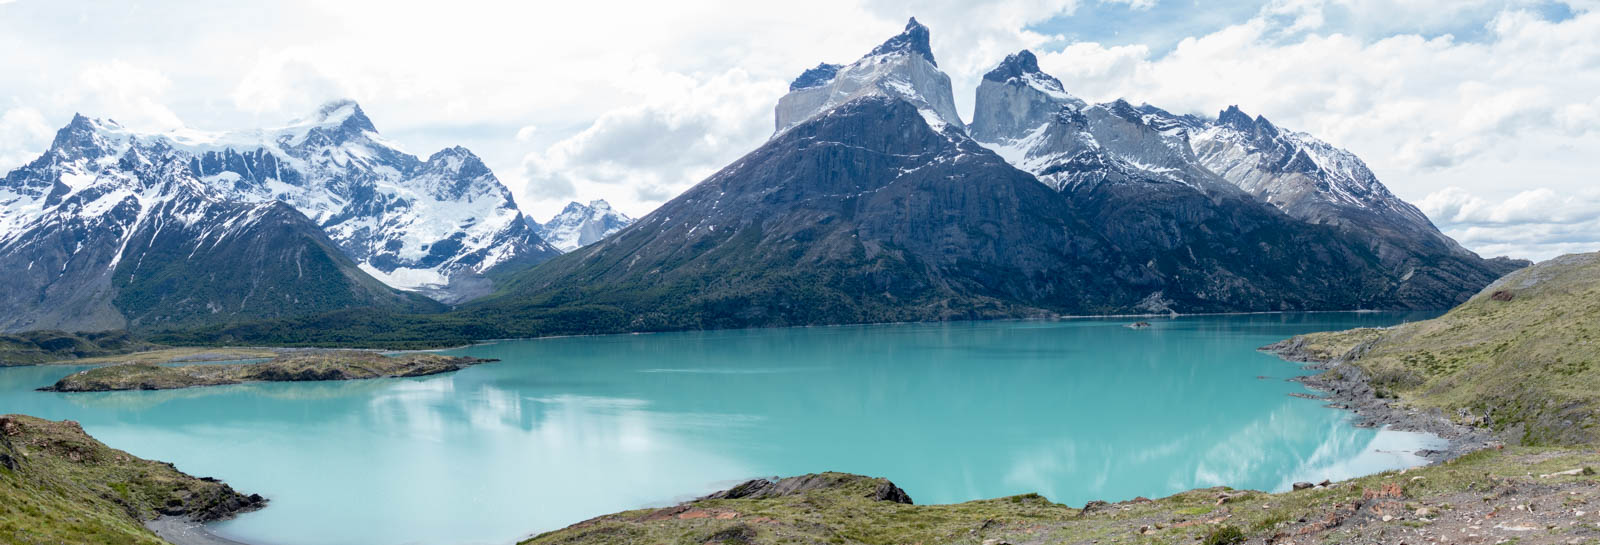 Panorama of Cuernos del Paine and Laguna Nordenskjold